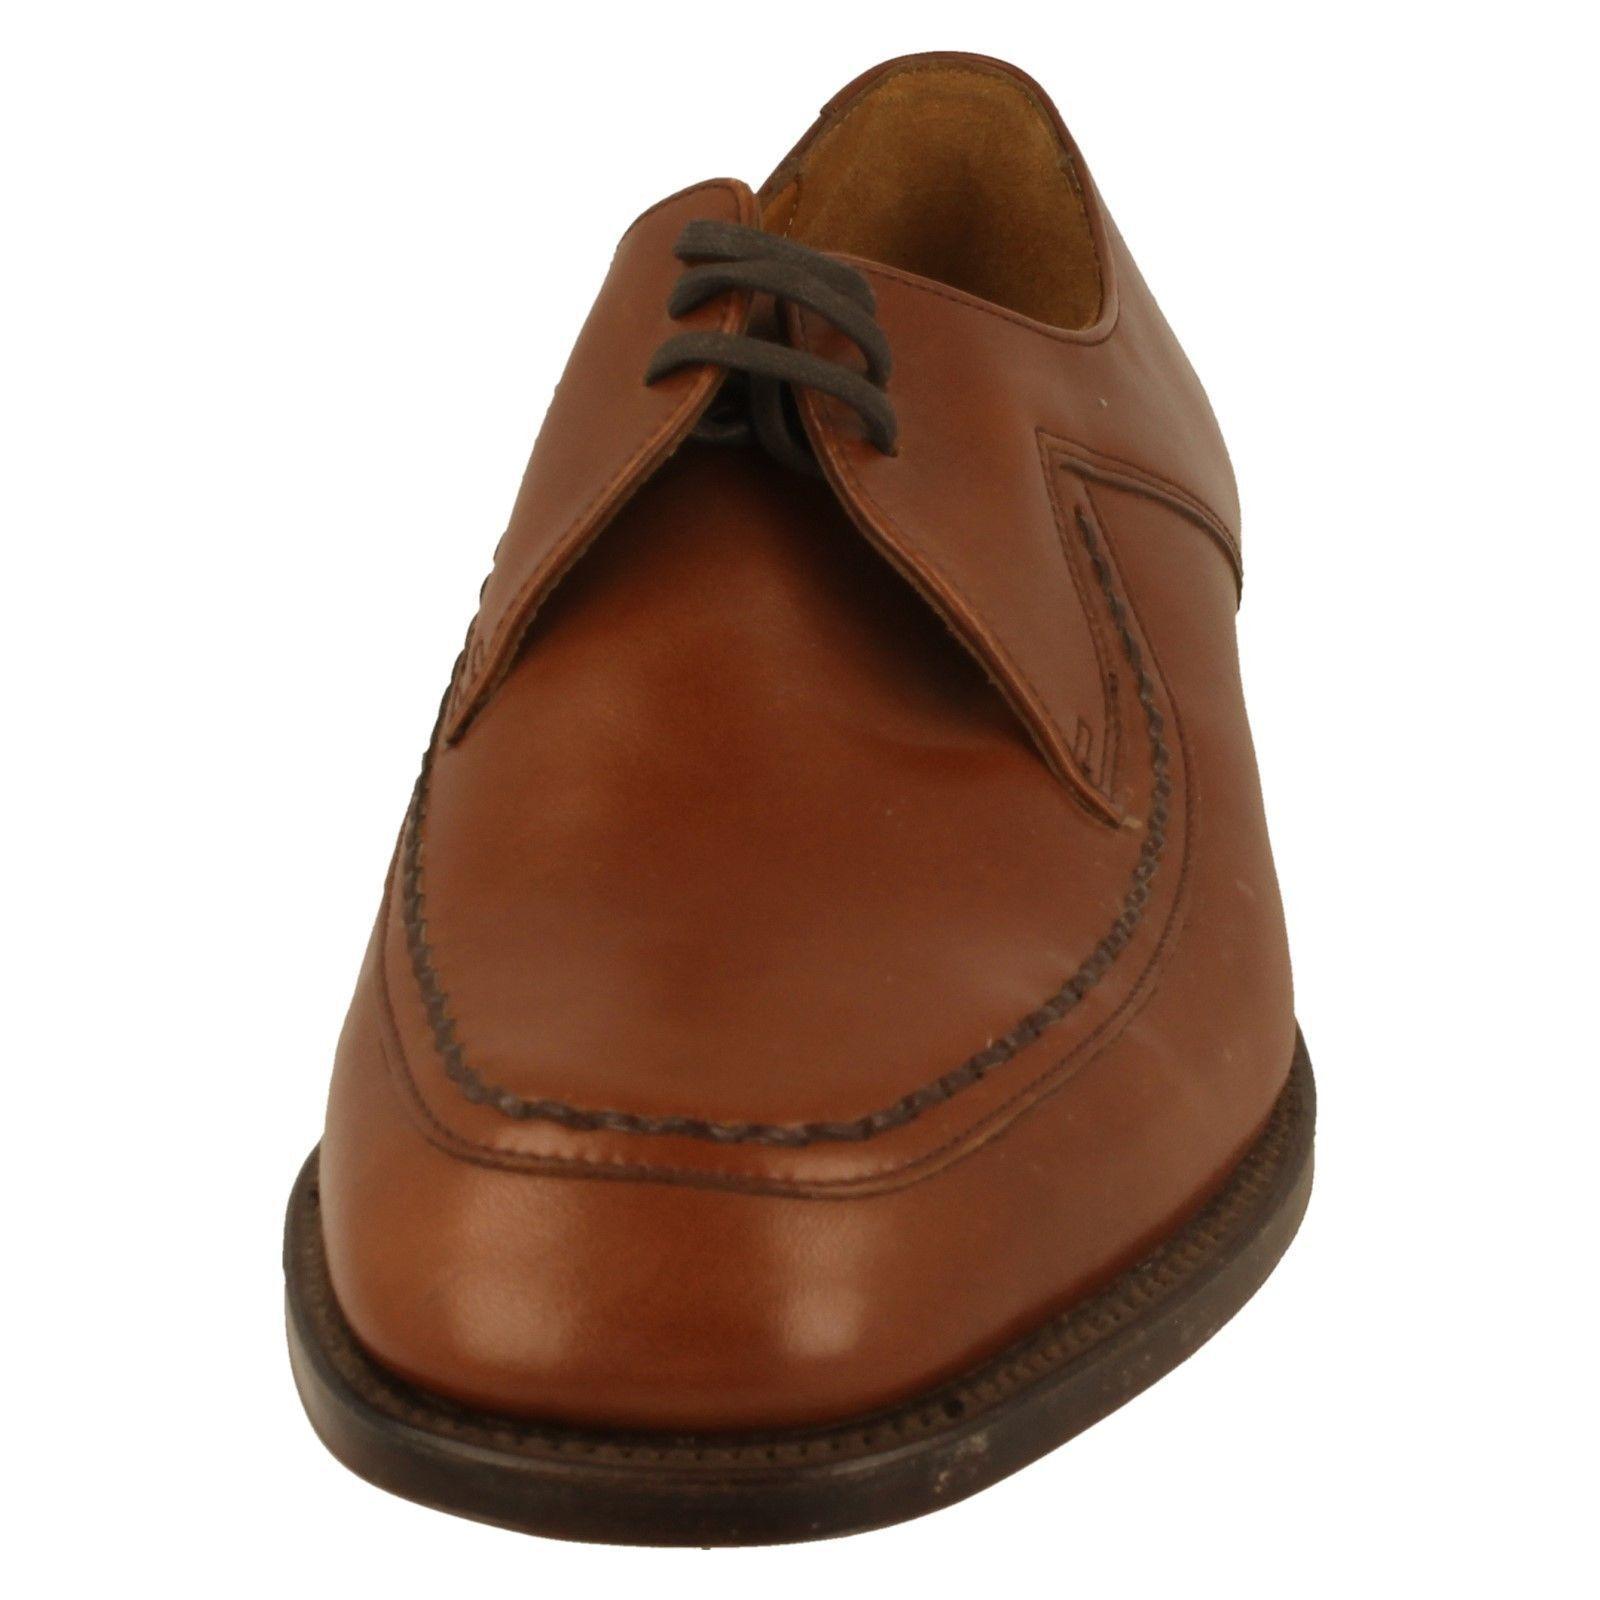 Herren Fontwell Fontwell Herren G fitting tan Leder lace up shoe by Loake 20b09b